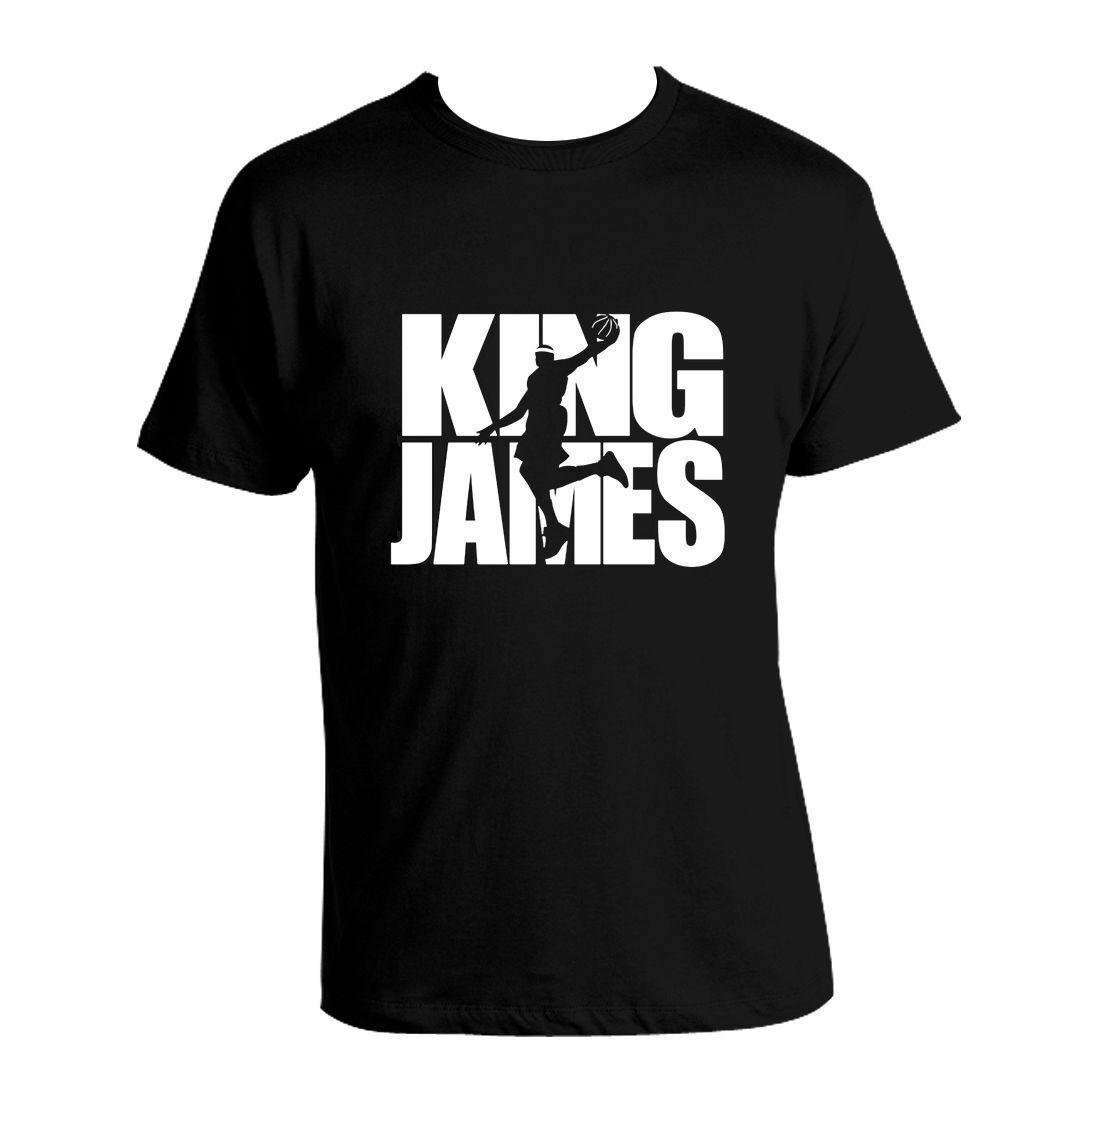 outlet store 643ec affaf Lebron James King James T Shirt MVP ClevelandFunny free shipping Unisex  Casual Tshirt